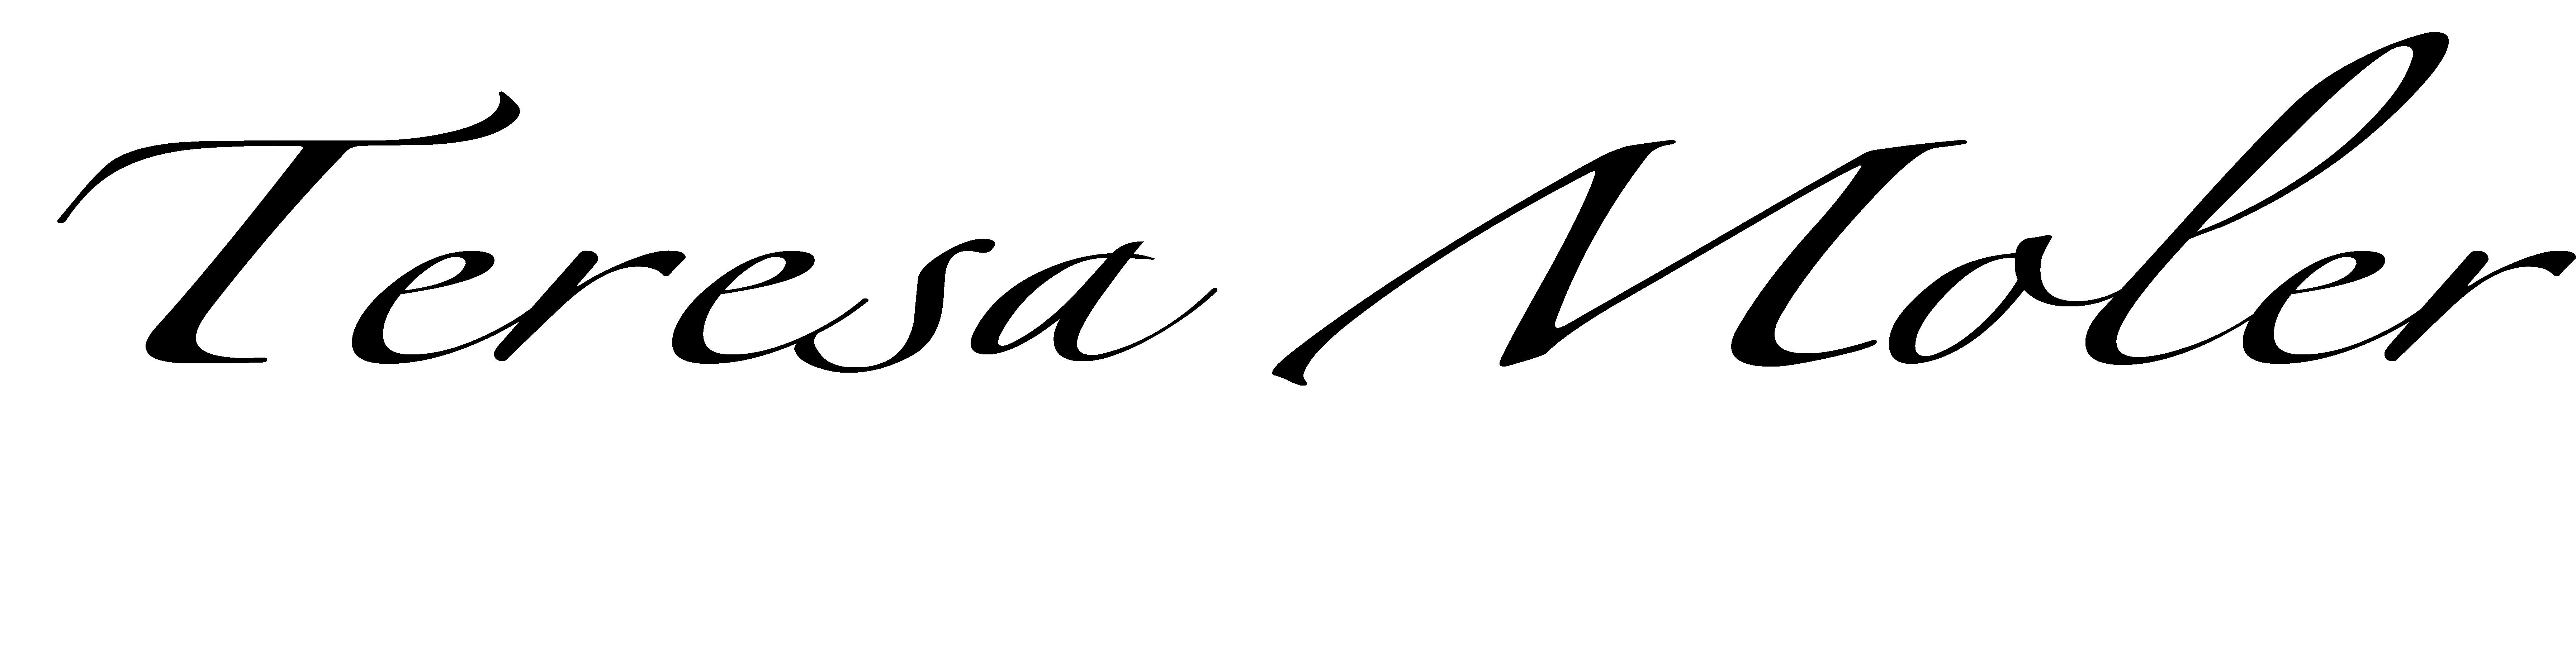 teresa Moler's Signature